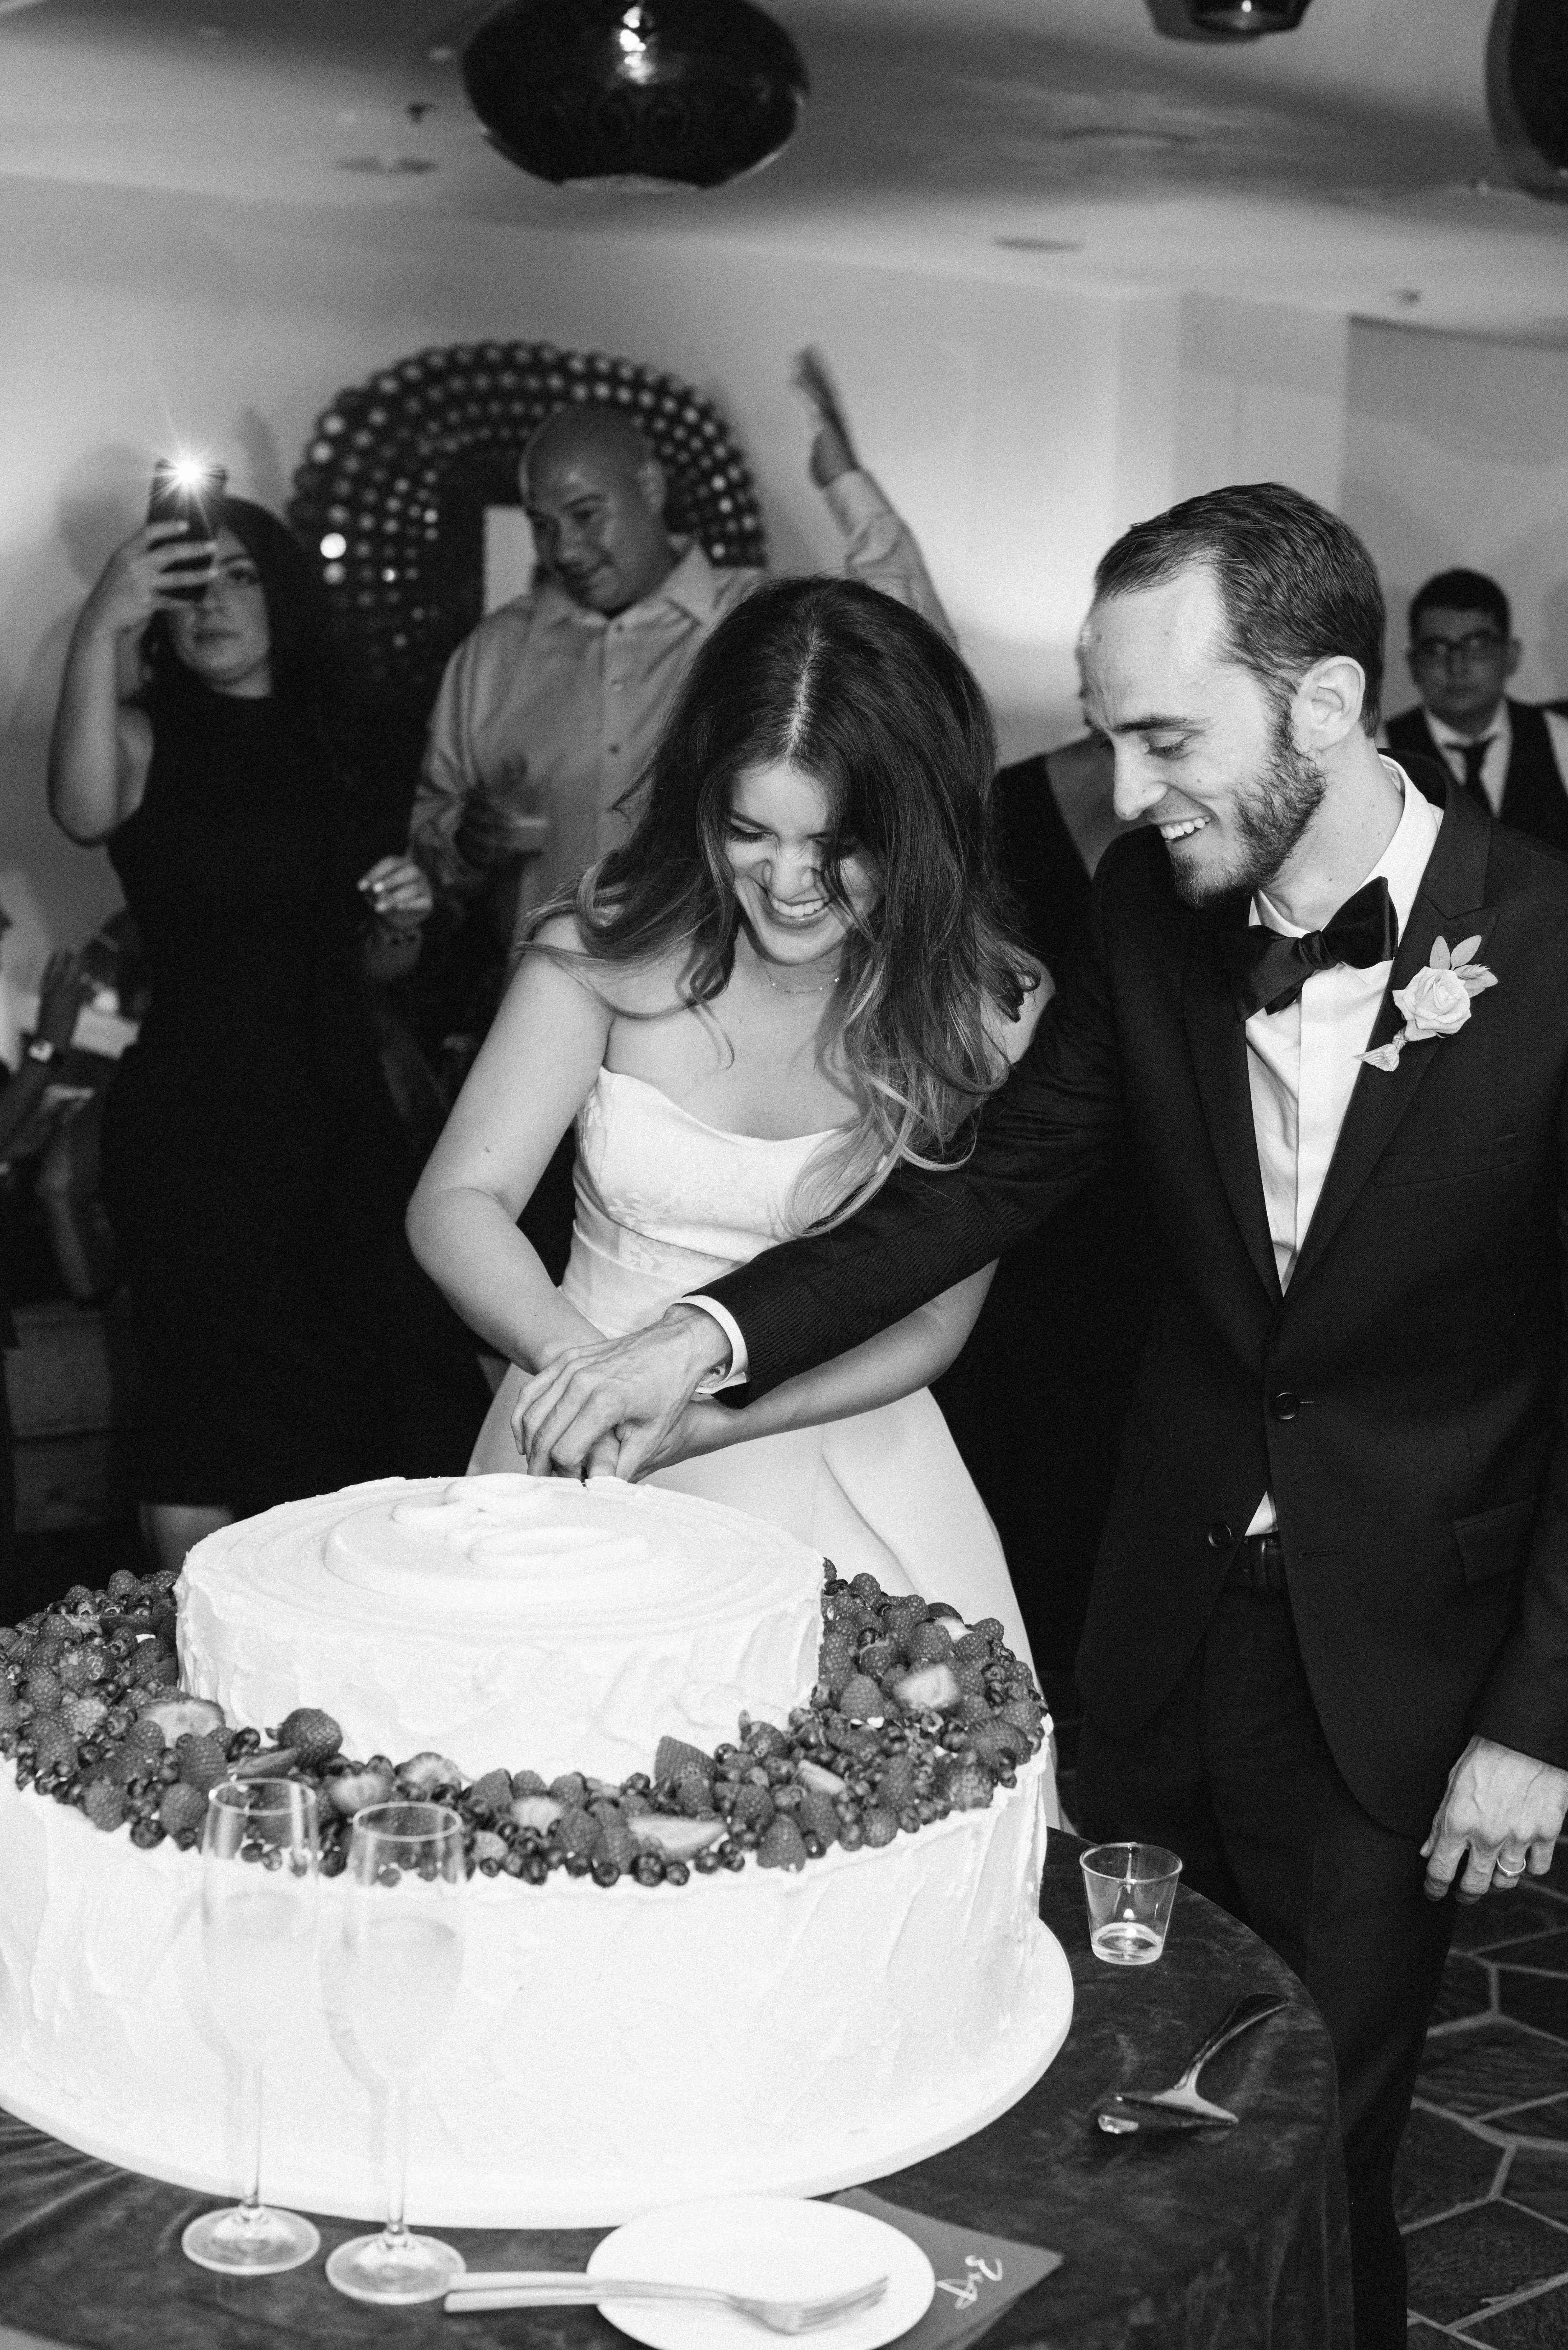 bride and groom cutitng cake